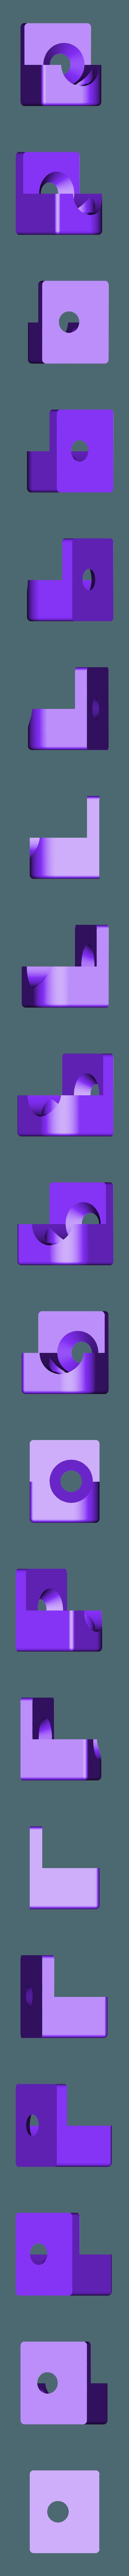 2020_Hinge_90_degree_v1-2.STL Download free STL file 2020 Hinge Corner • 3D printable design, WalterHsiao